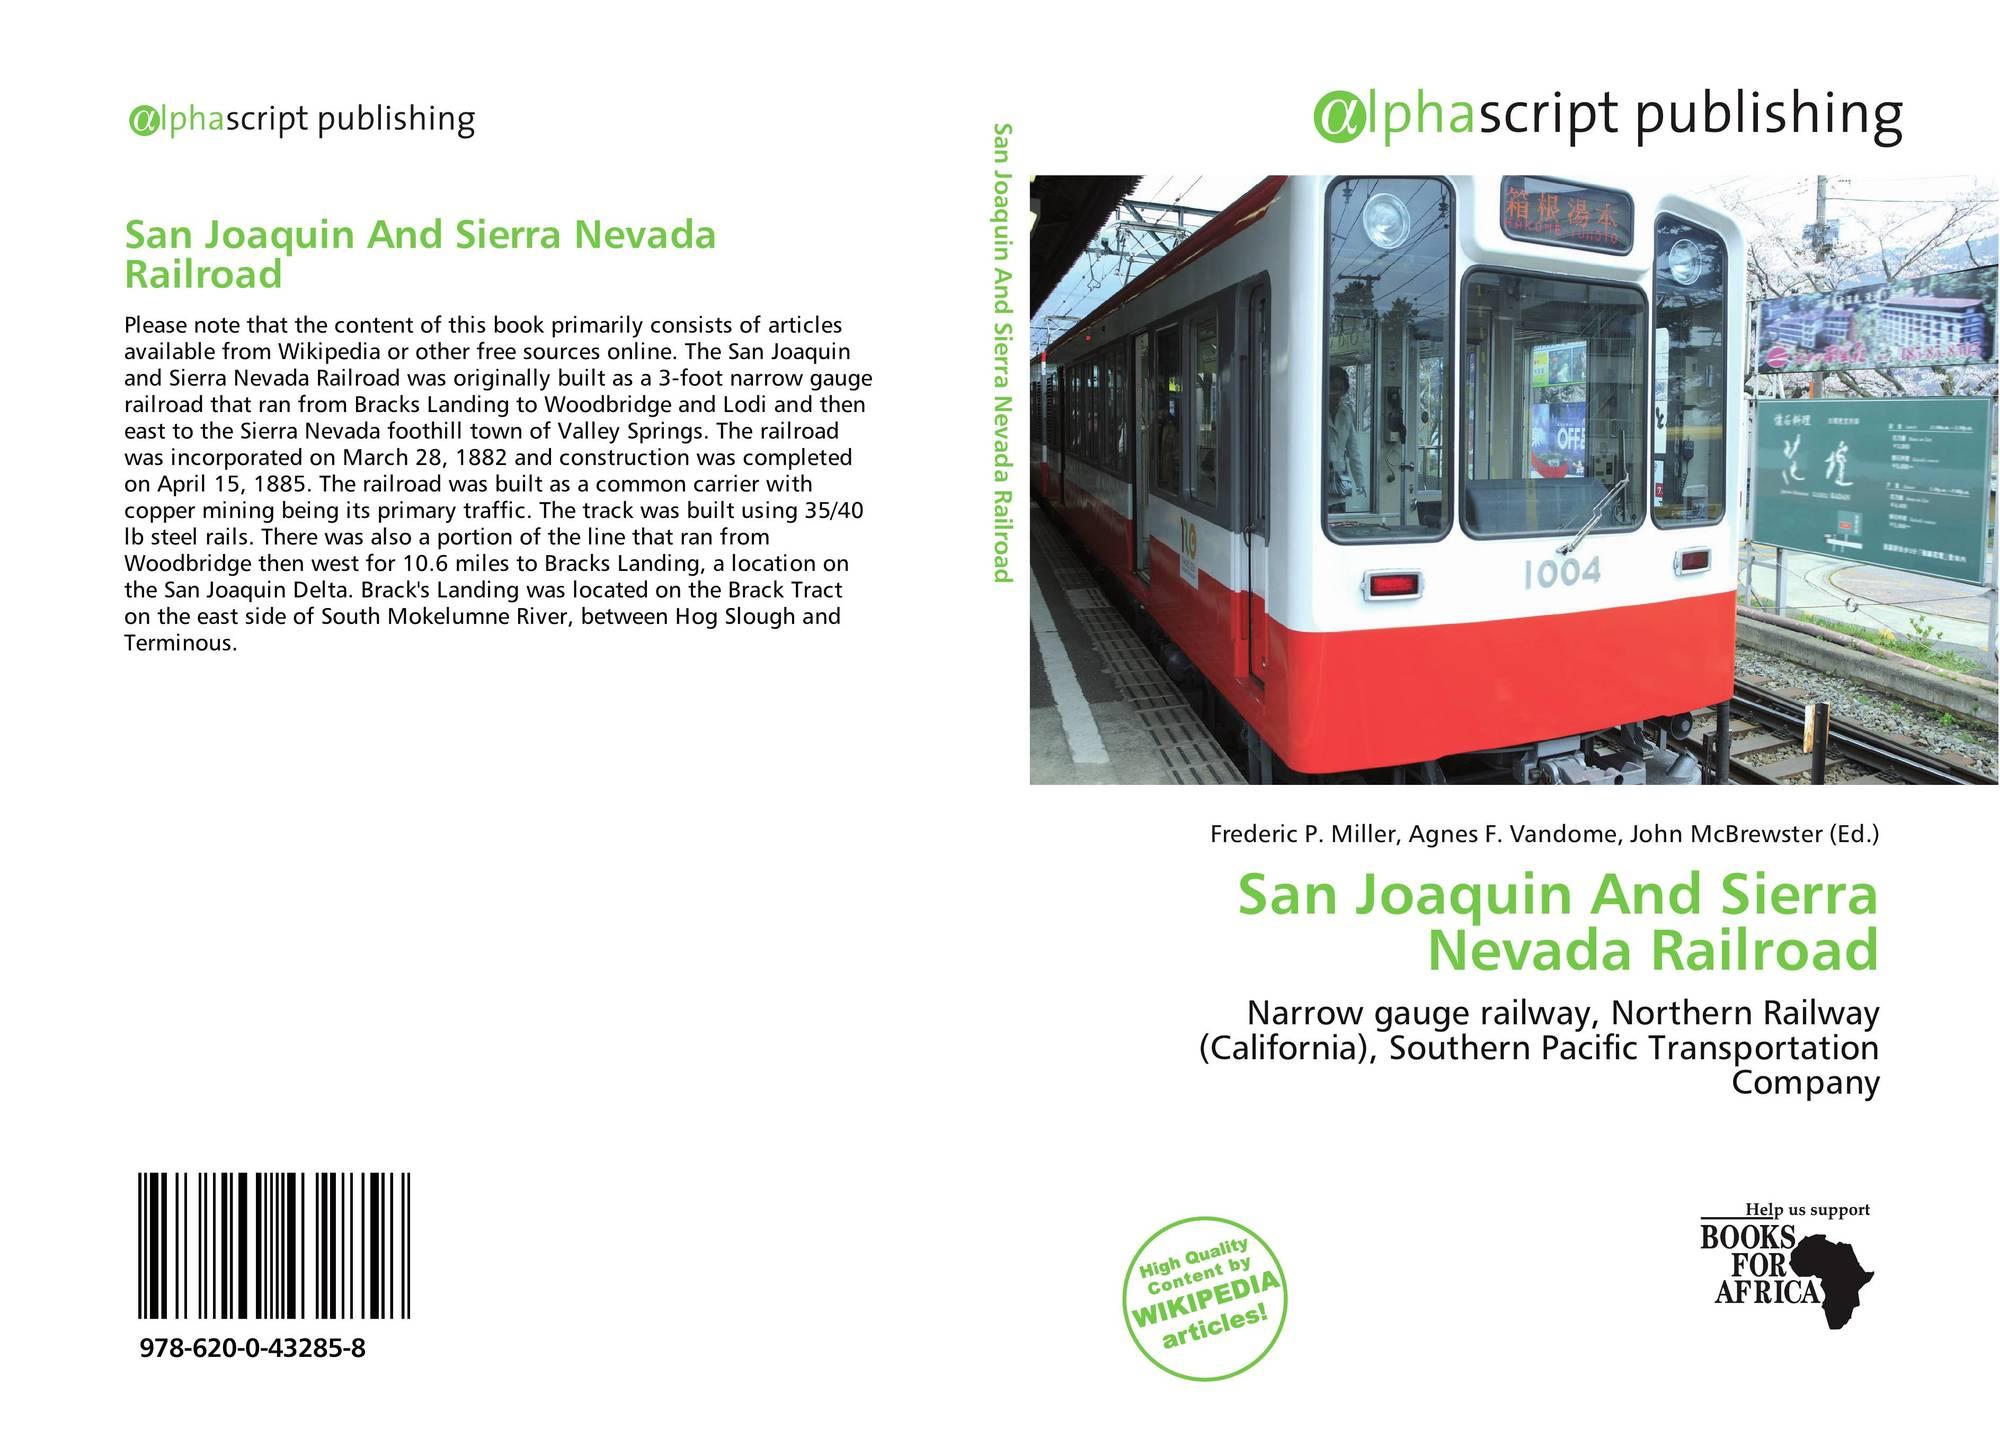 San Joaquin And Sierra Nevada Railroad, 978-620-0-43285-8